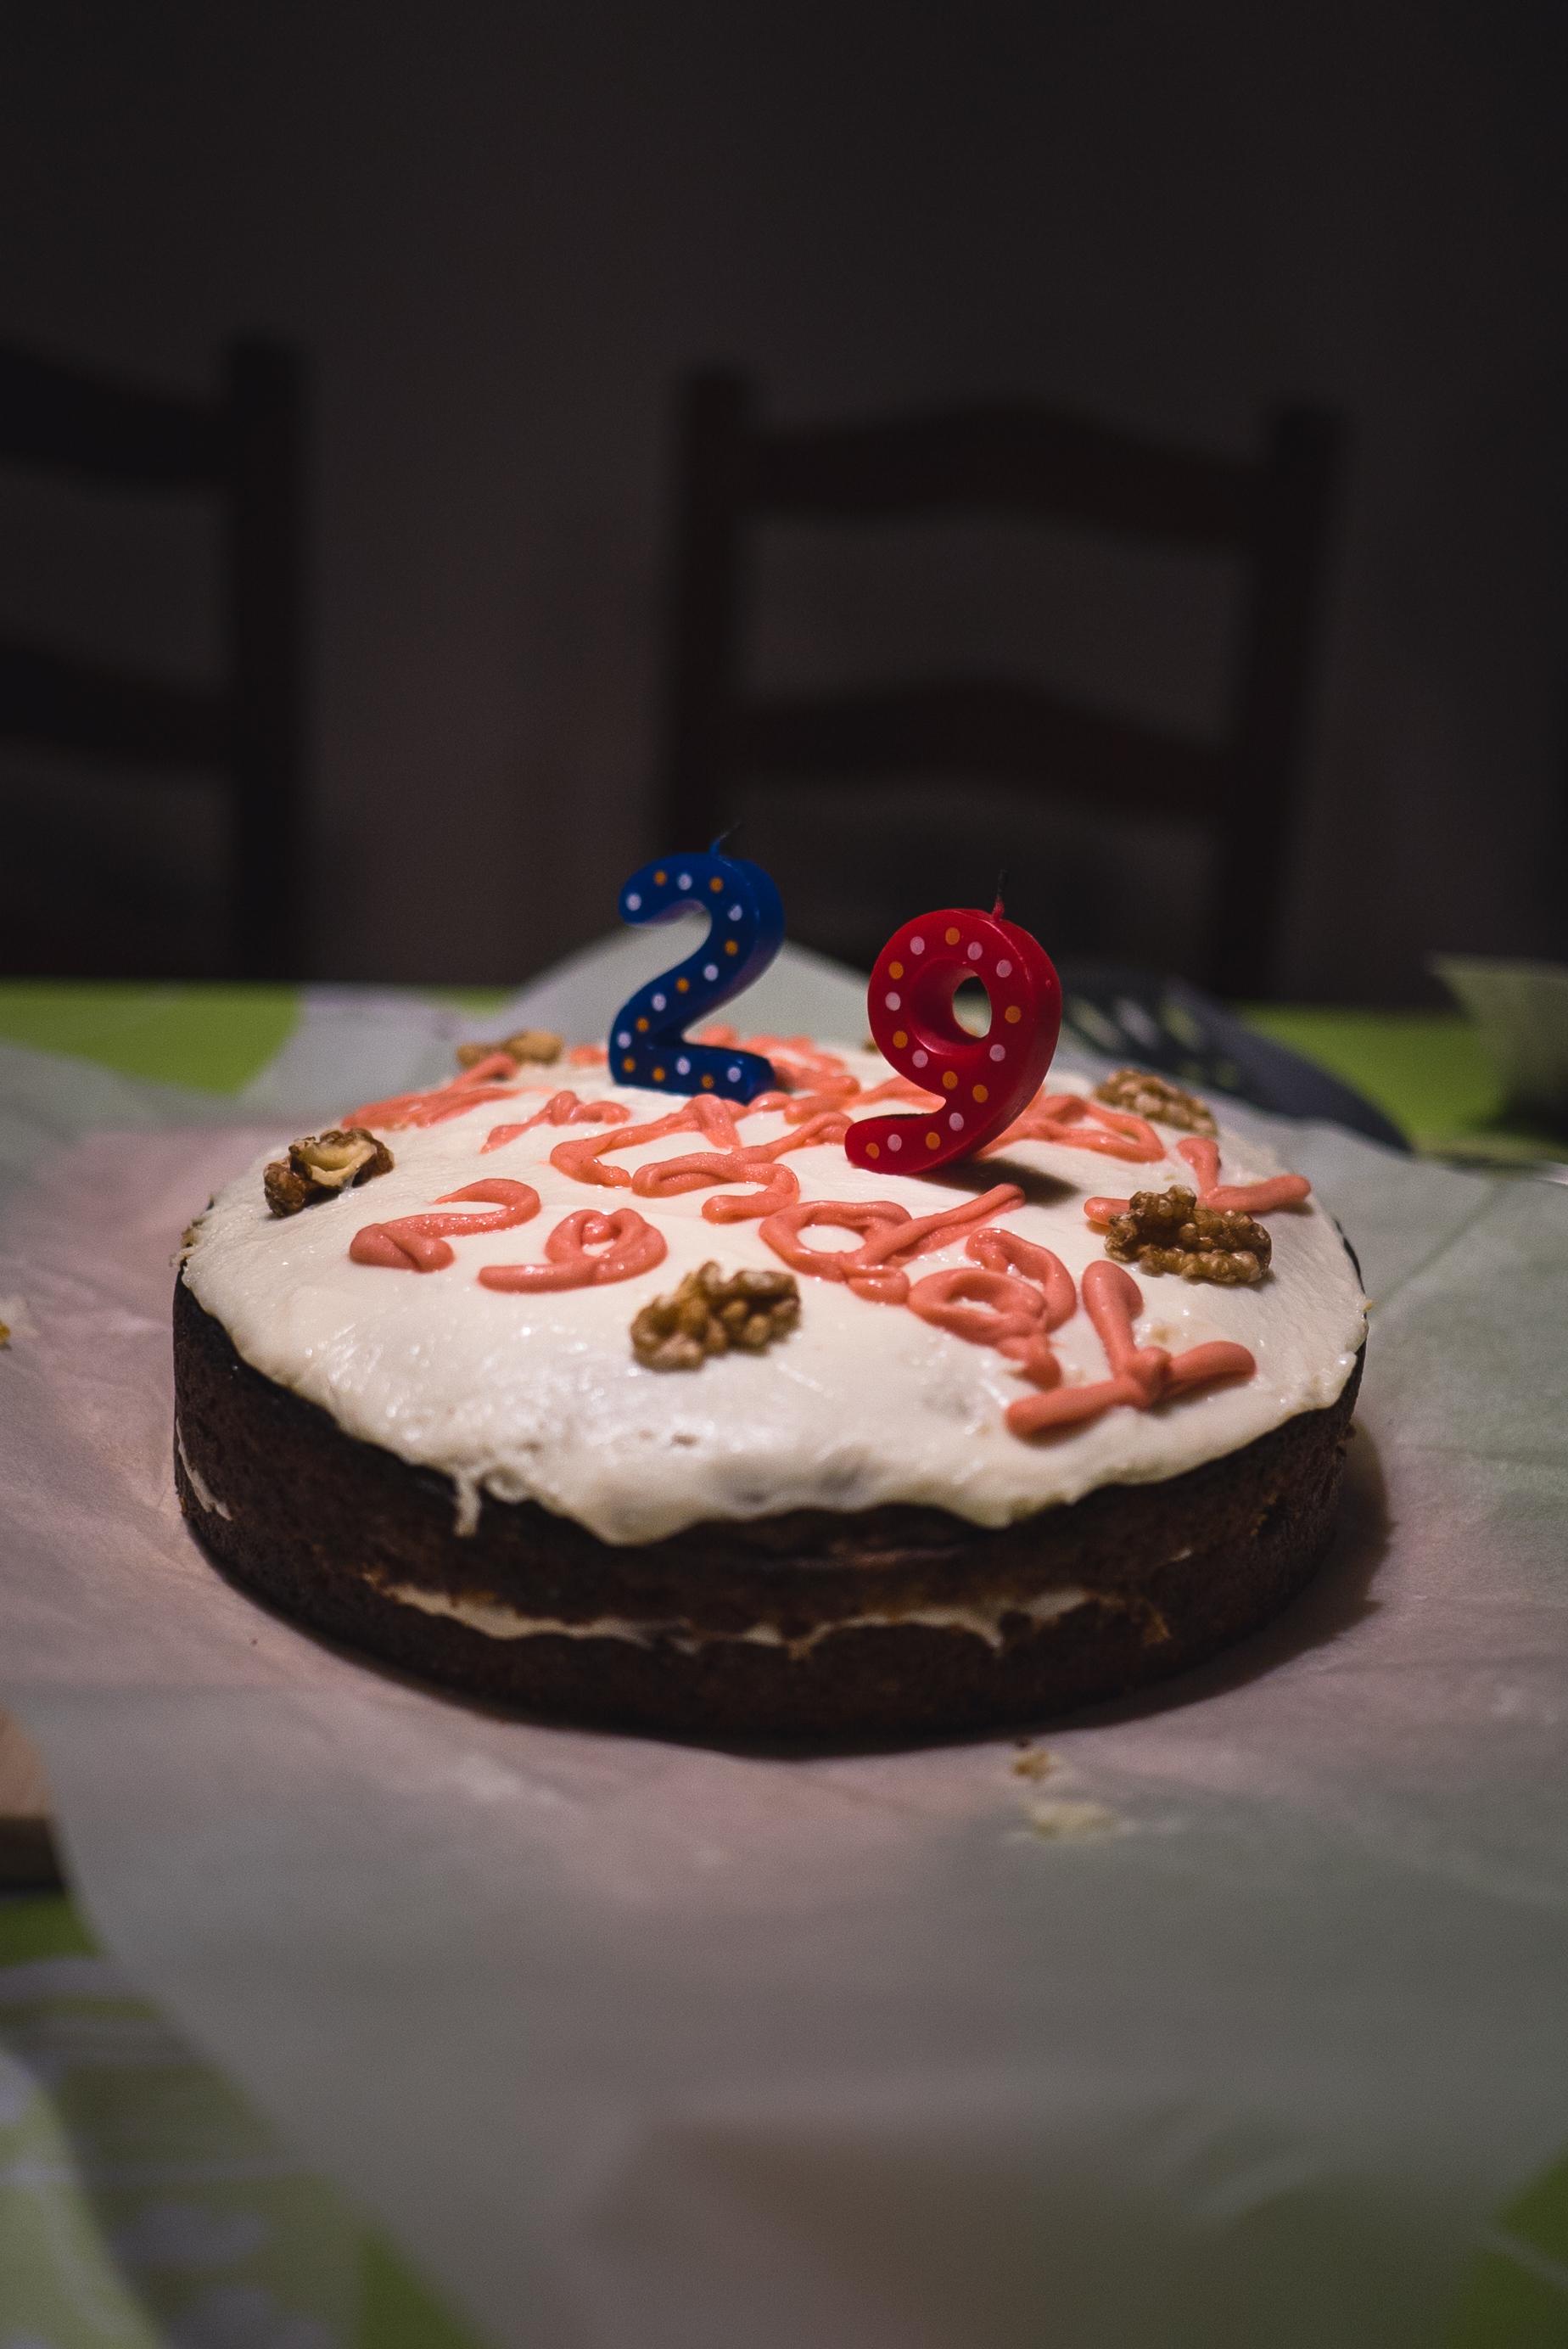 Birthday cake for Jon's surprise birthday party 😍